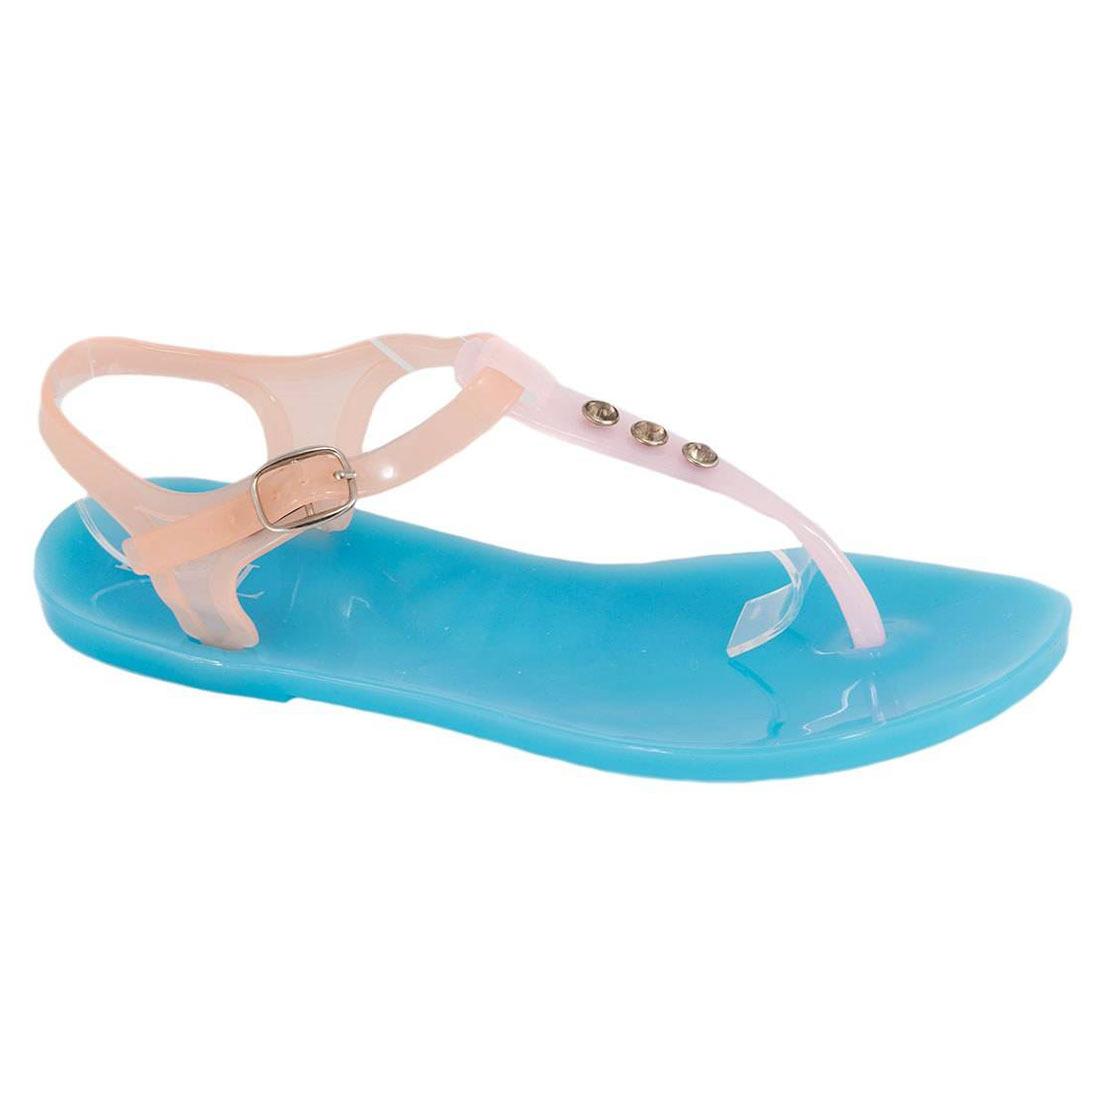 Sandale din cauciuc albastre C270A